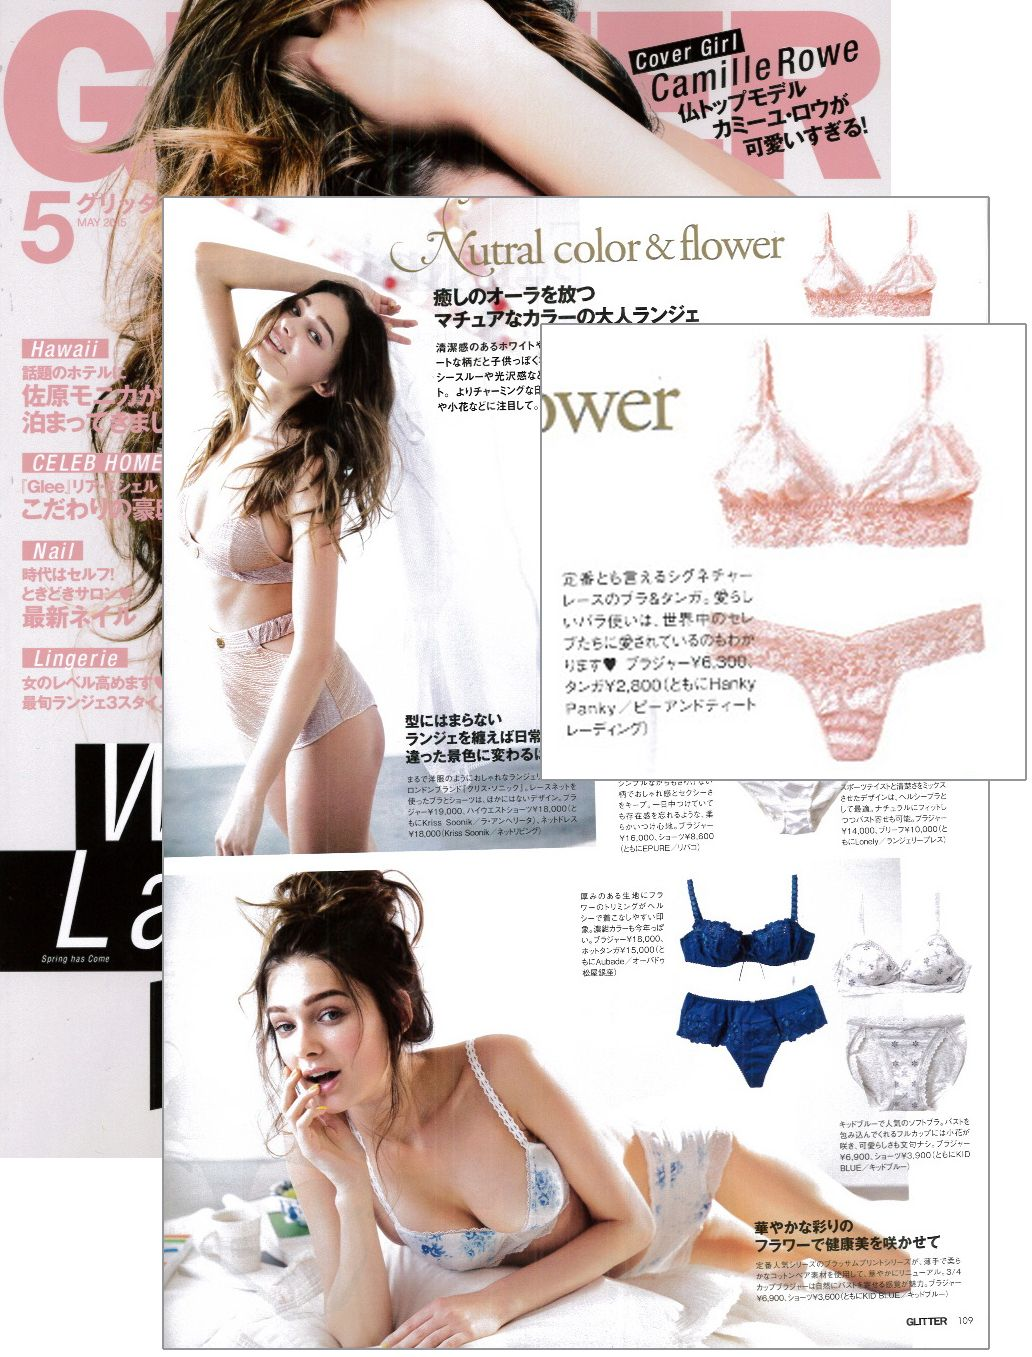 ab2707d17e707 Hanky Panky Signature Lace Bralette   Low Rise Thong. Glitter Magazine